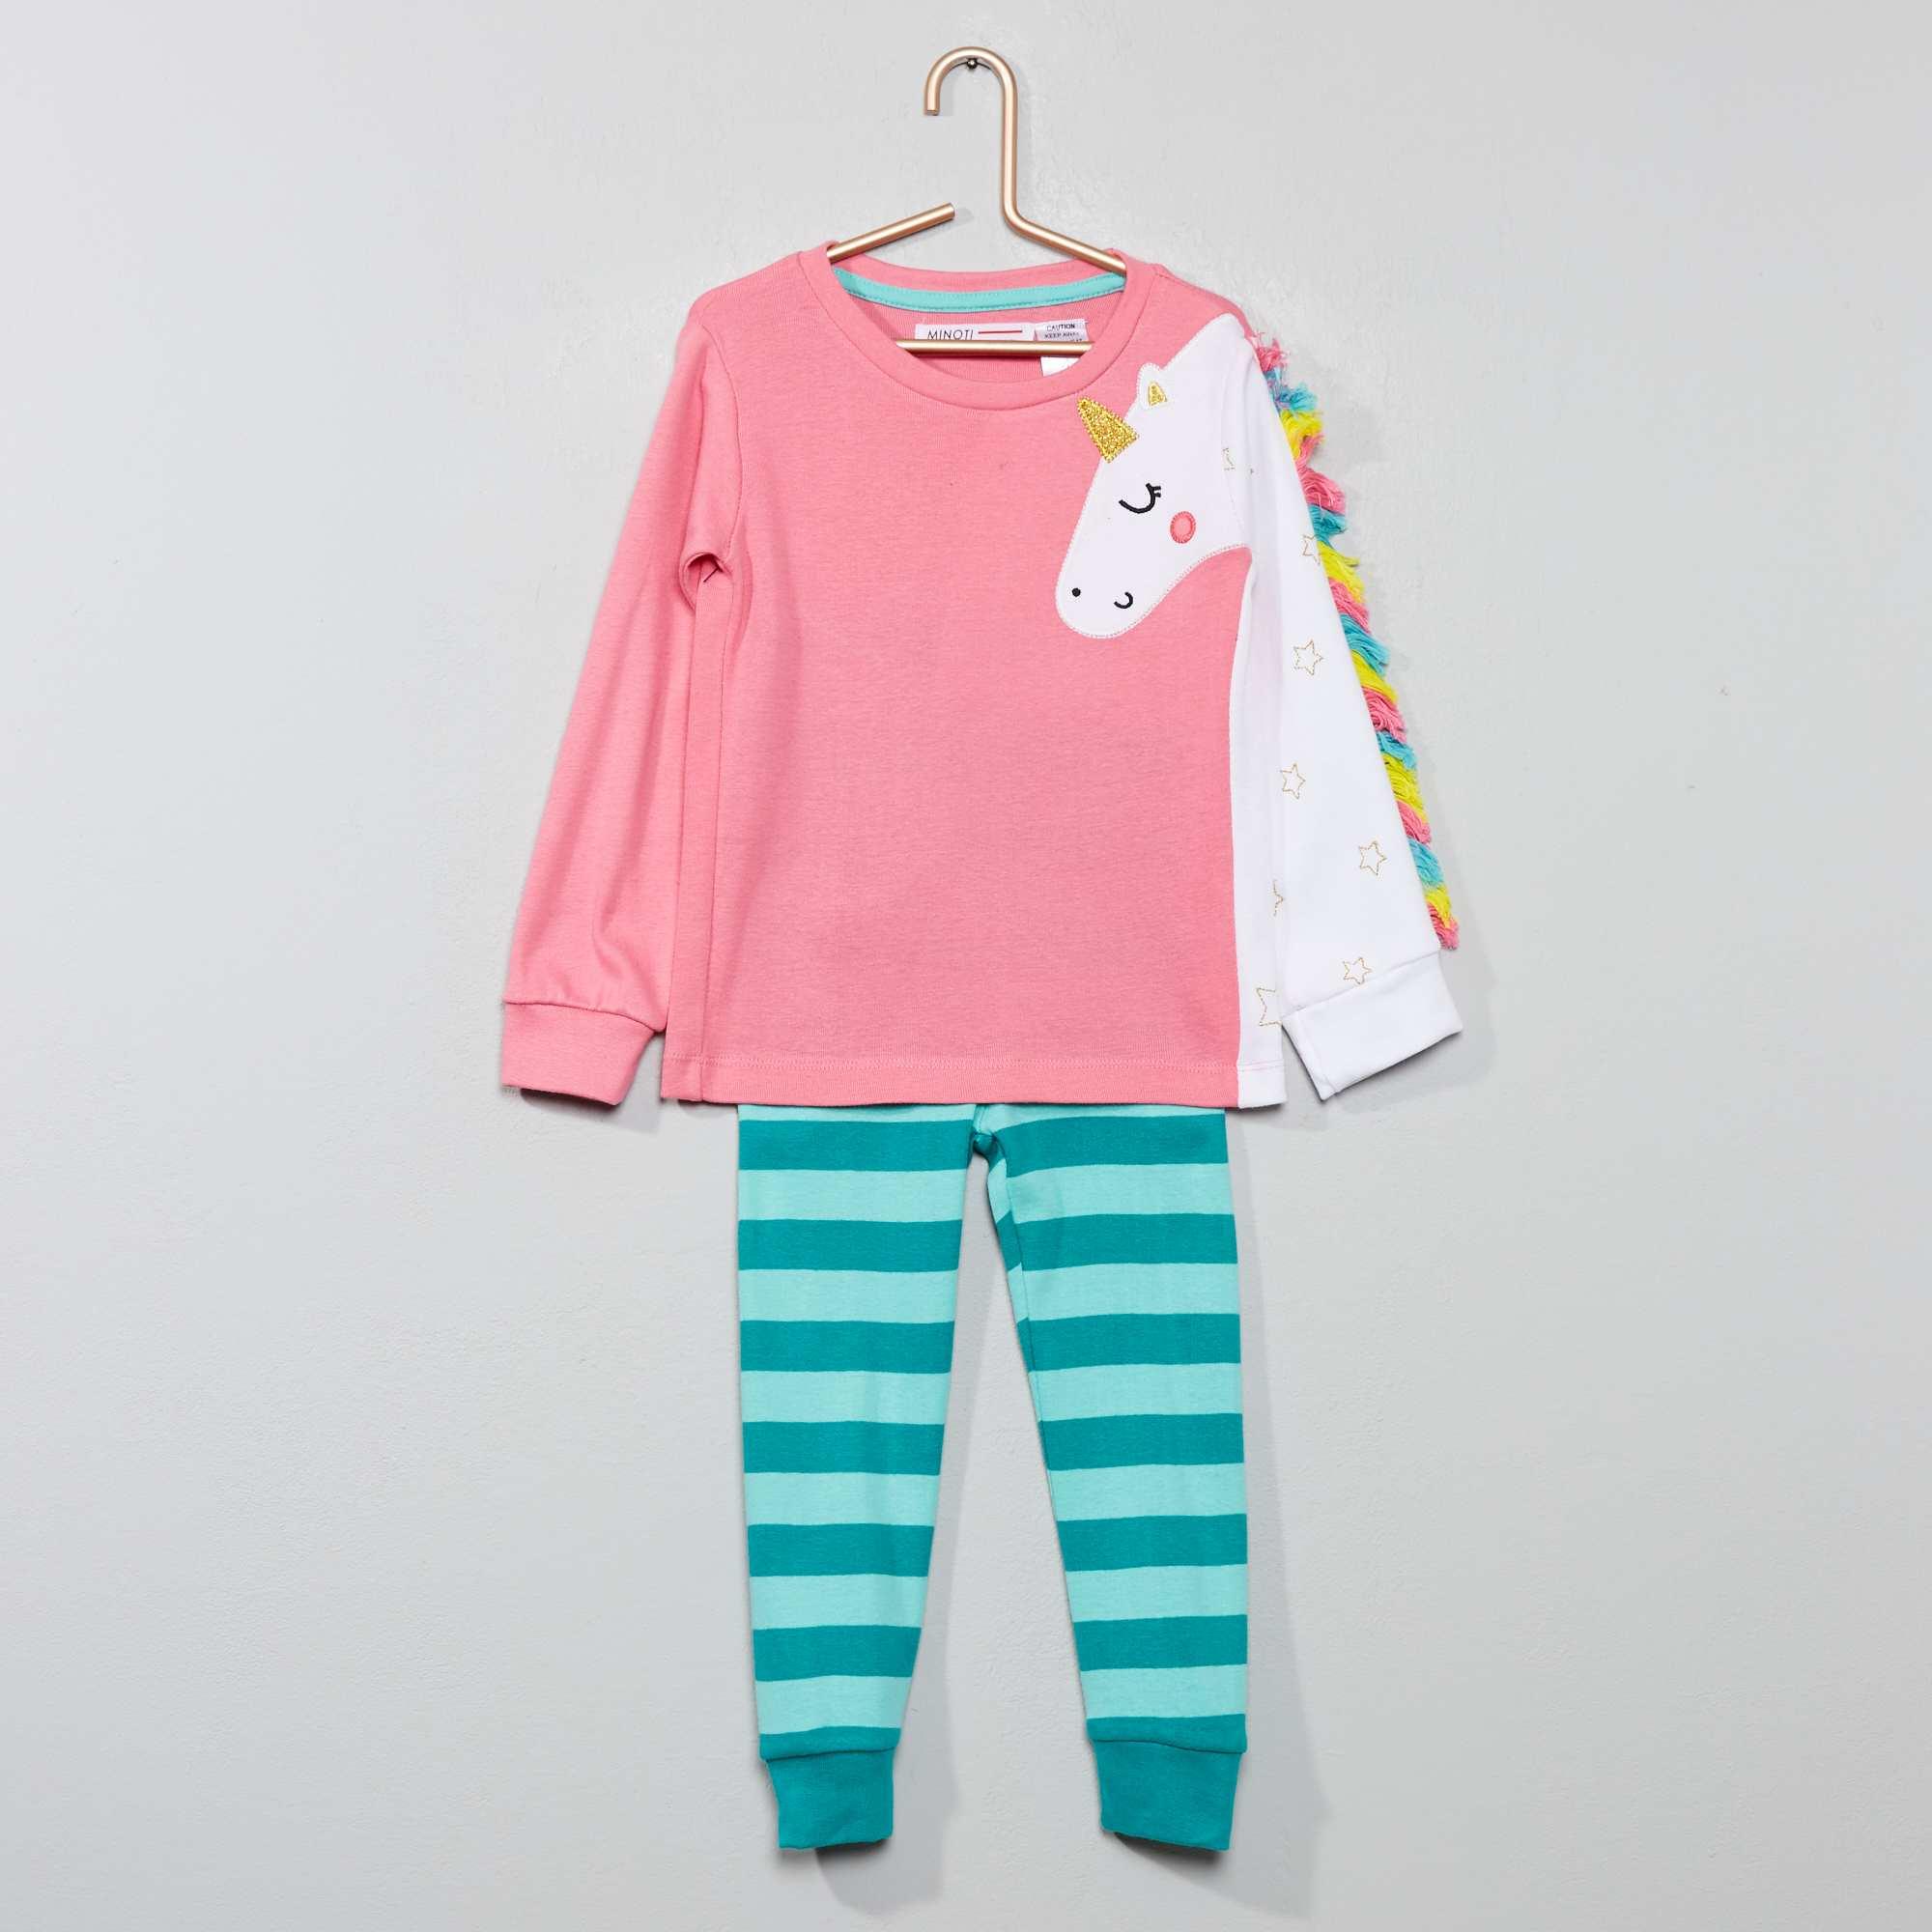 adf167af6d6cb Pyjama long 'licorne' Fille - rose/bleu - Kiabi - 14,00€